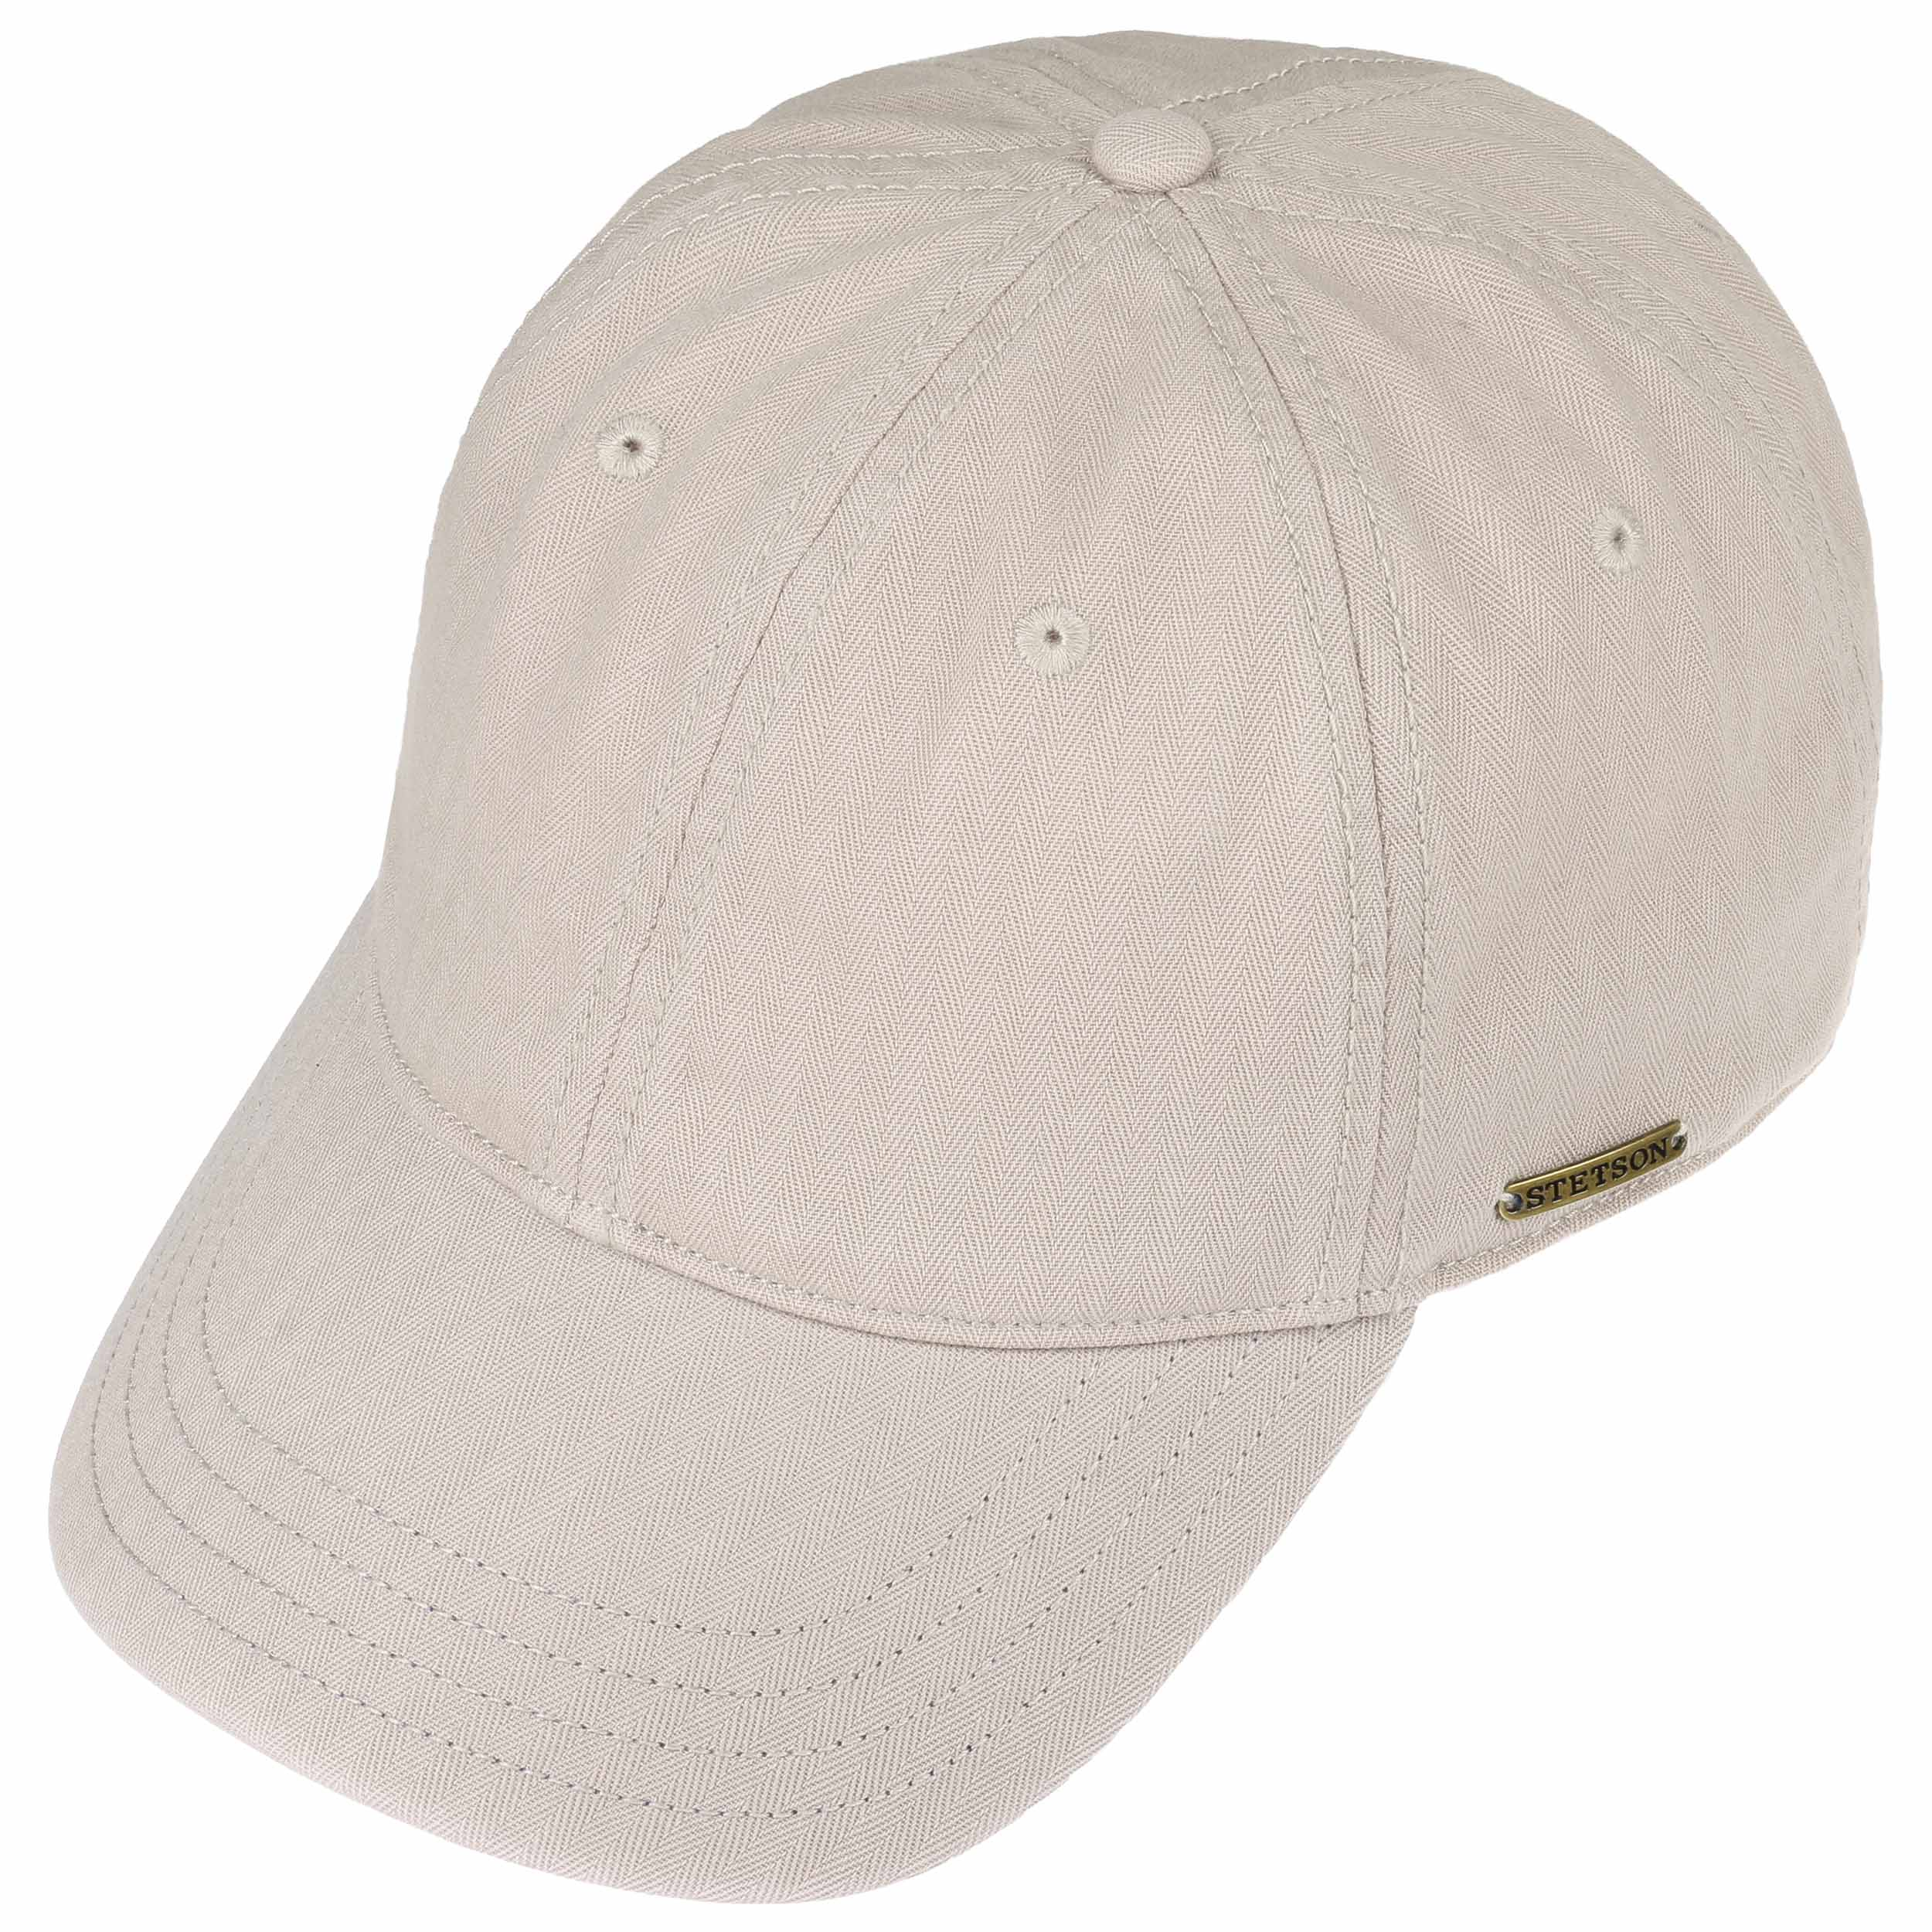 e01c5379d75 ... Marshal Cotton Baseball Cap by Stetson - beige-blue 1 ...